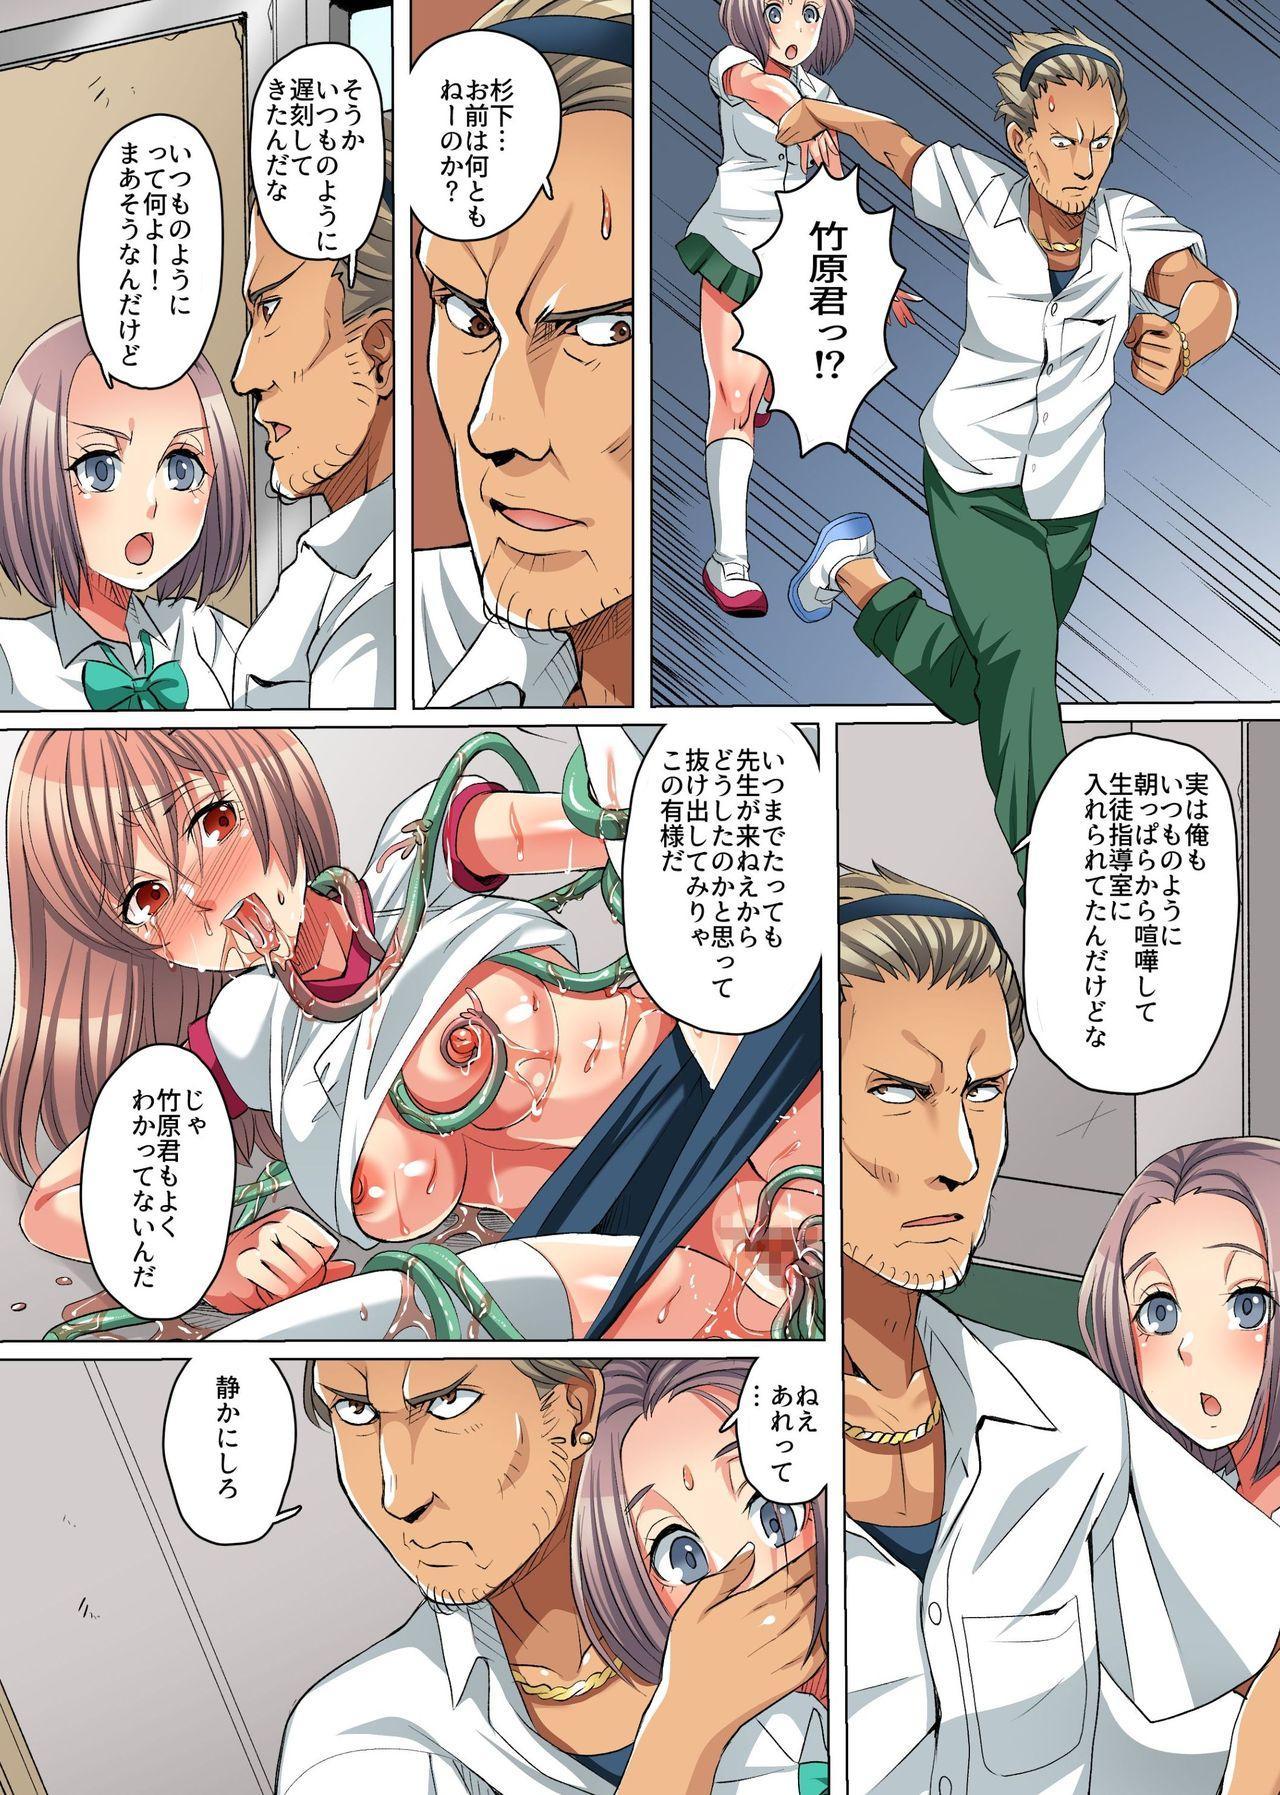 zetsubou no kyoushitsu 13